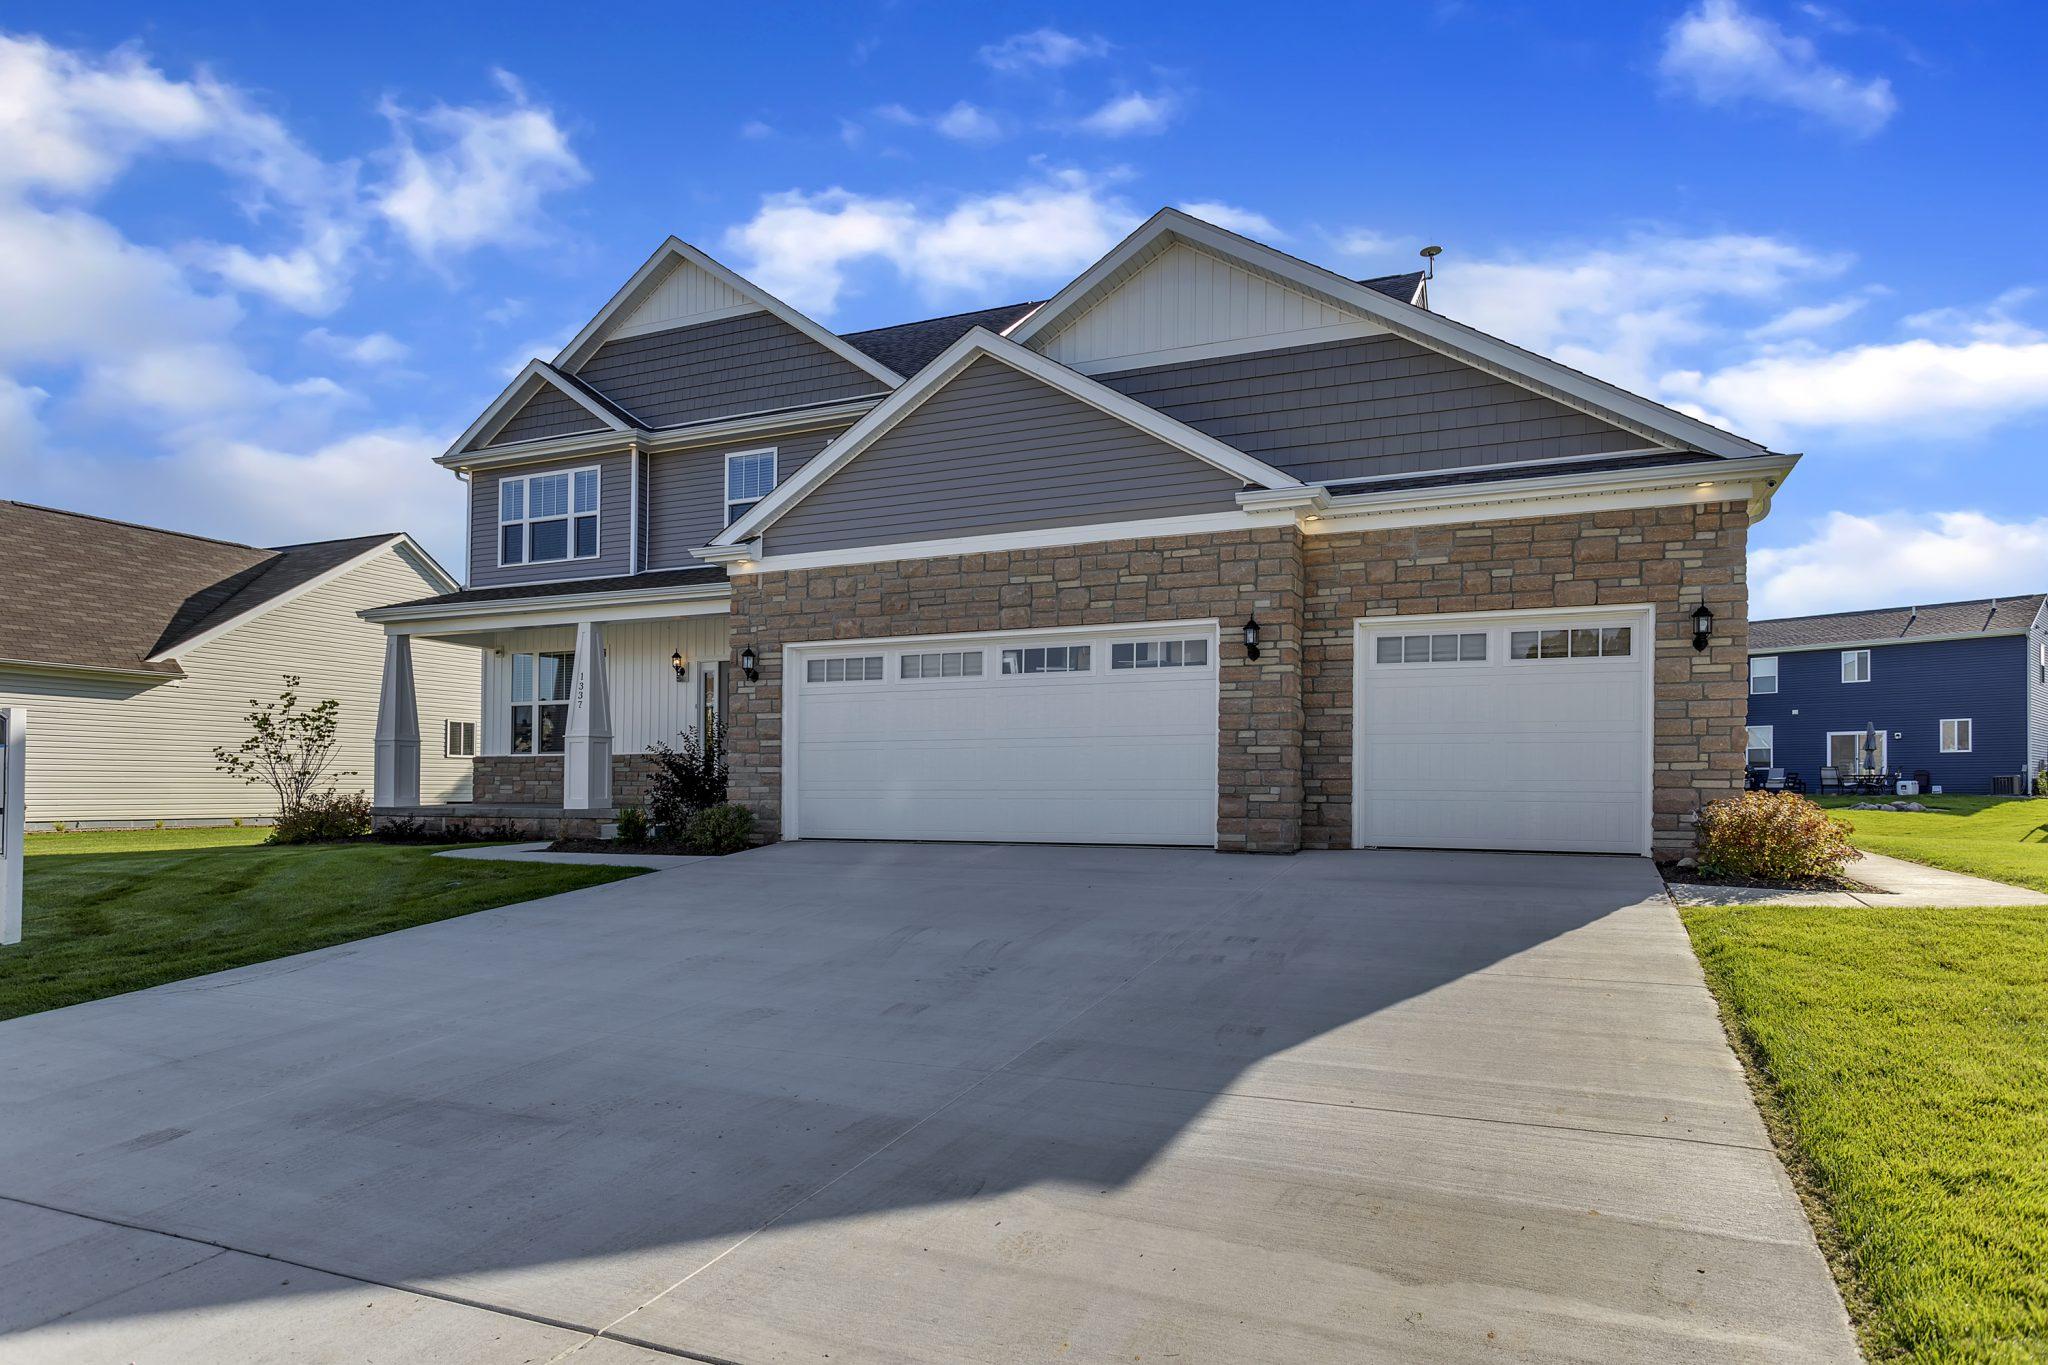 363 Trestle Drive, Highlands Homesite 4